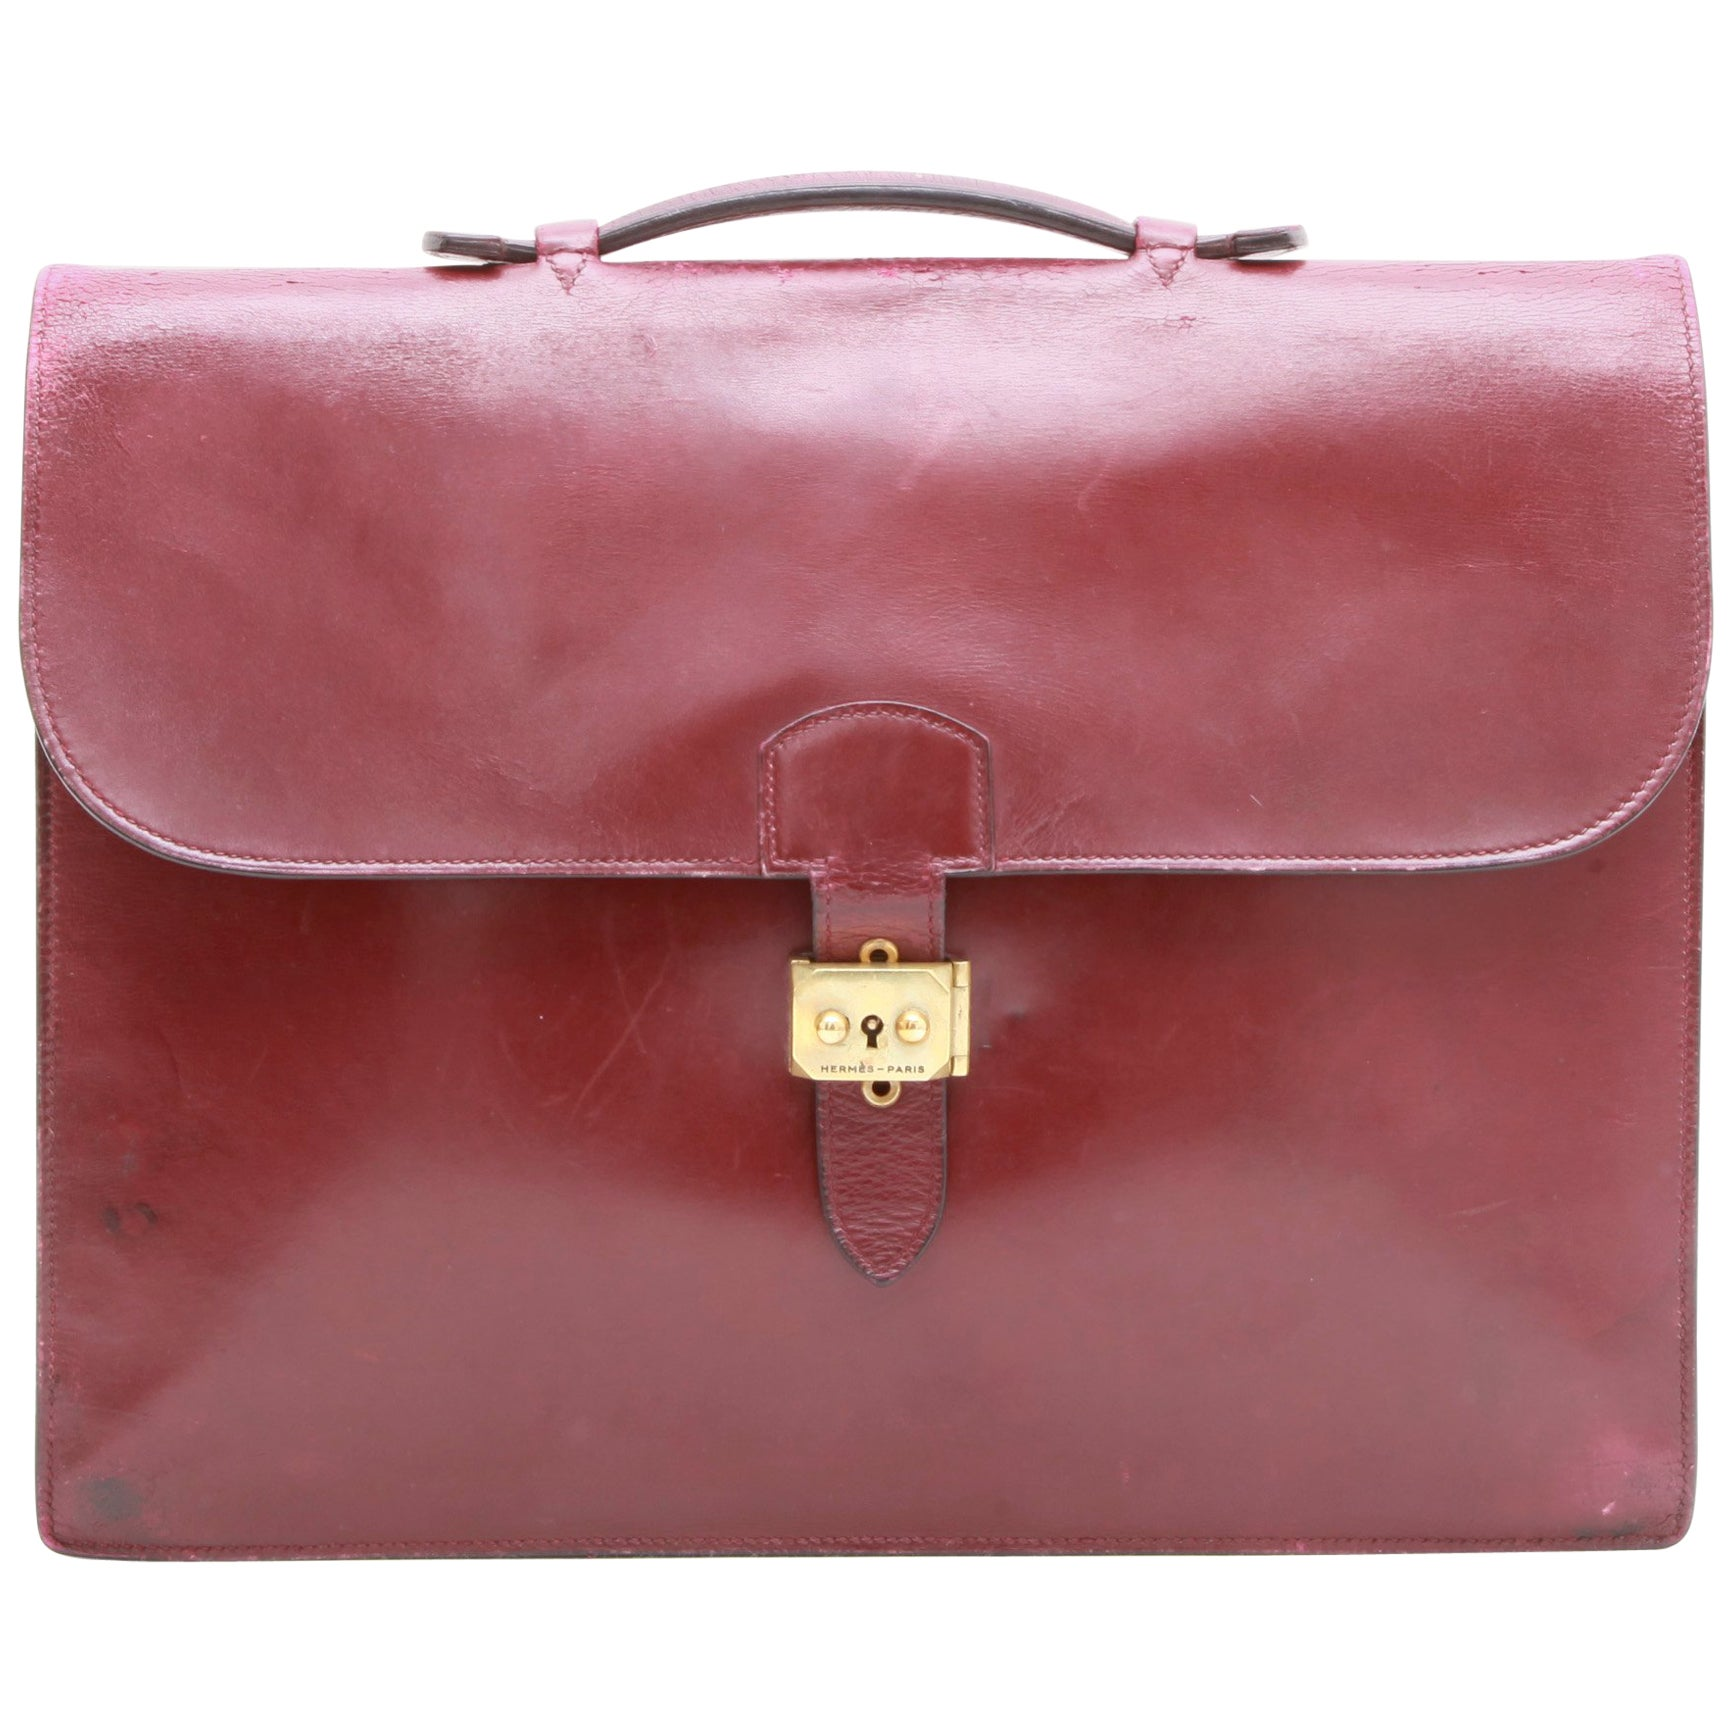 1db48002cddec HERMES Vintage Aktentasche in H Rote Lederbox bei 1stdibs